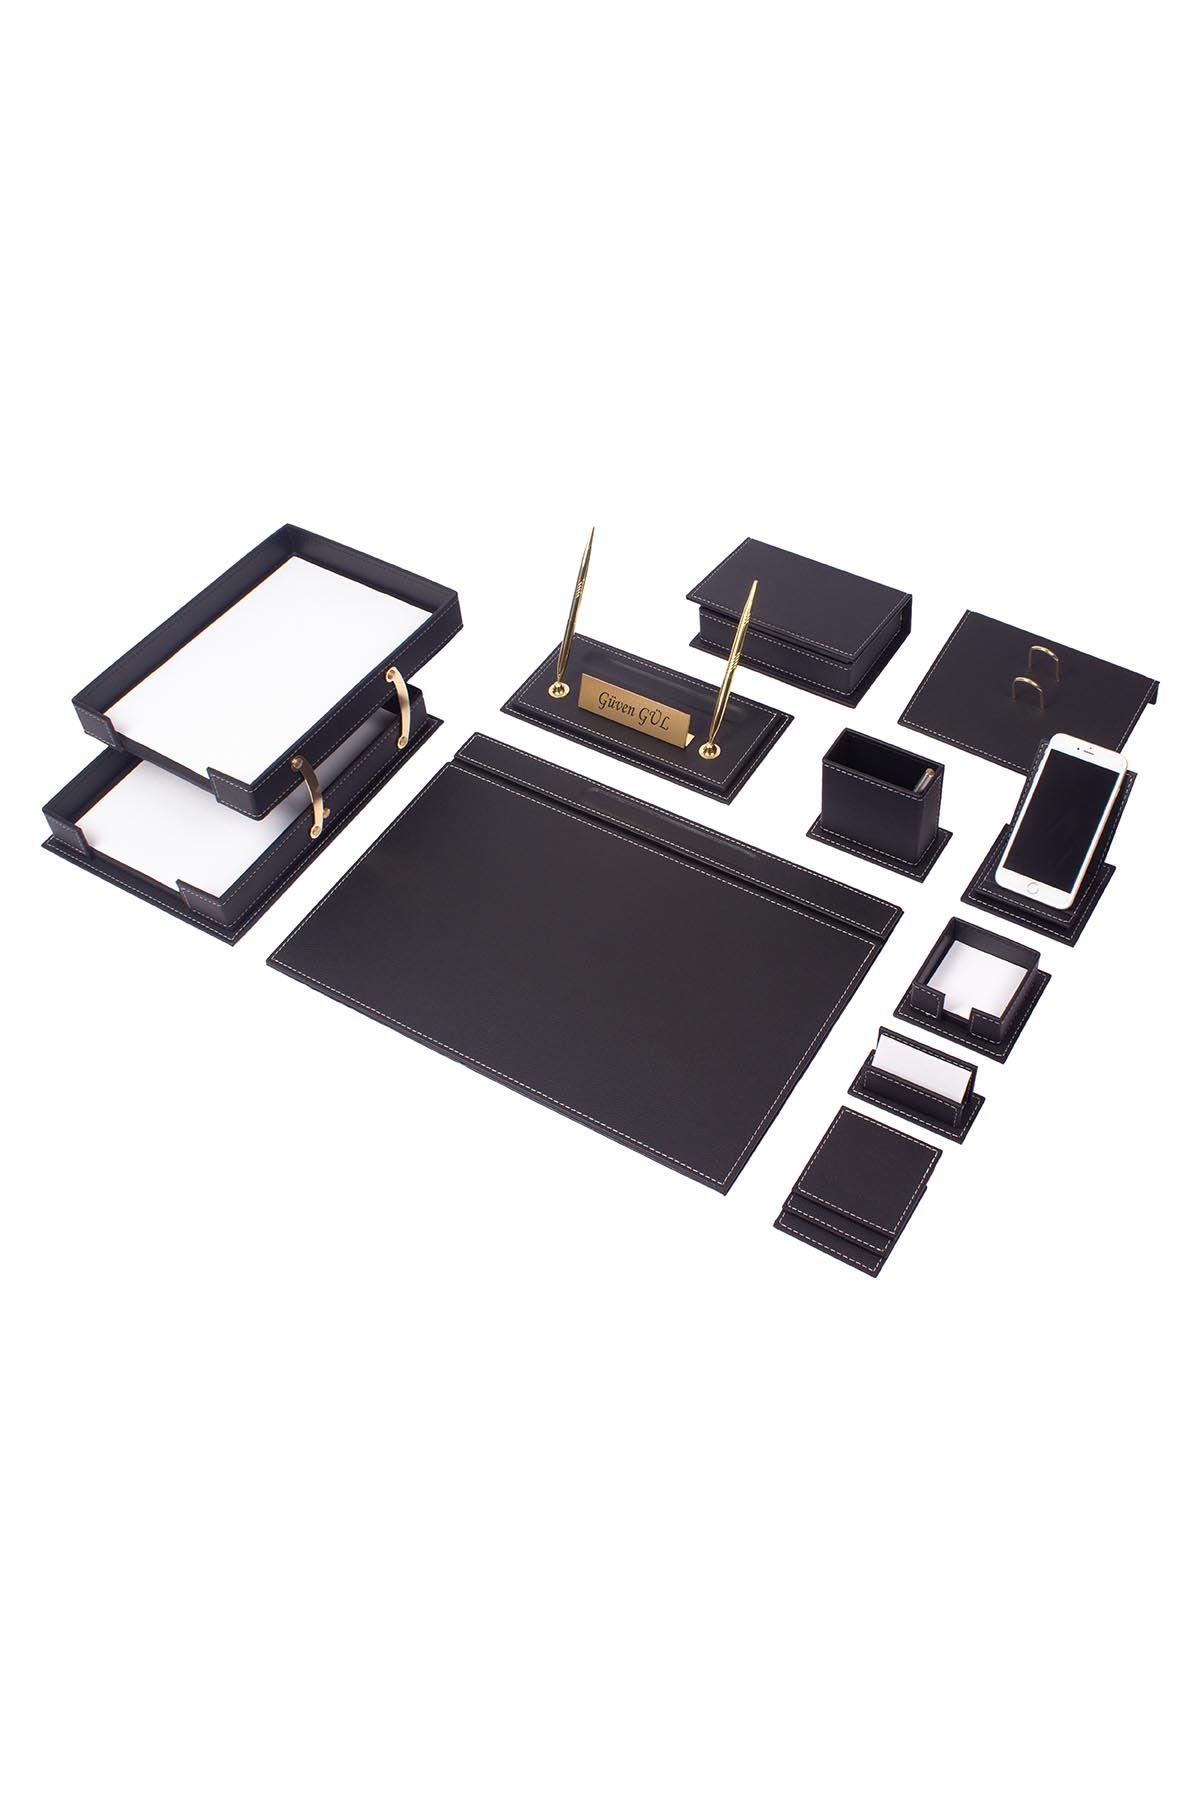 Vega Leather Desk Set Black 14 Accessories